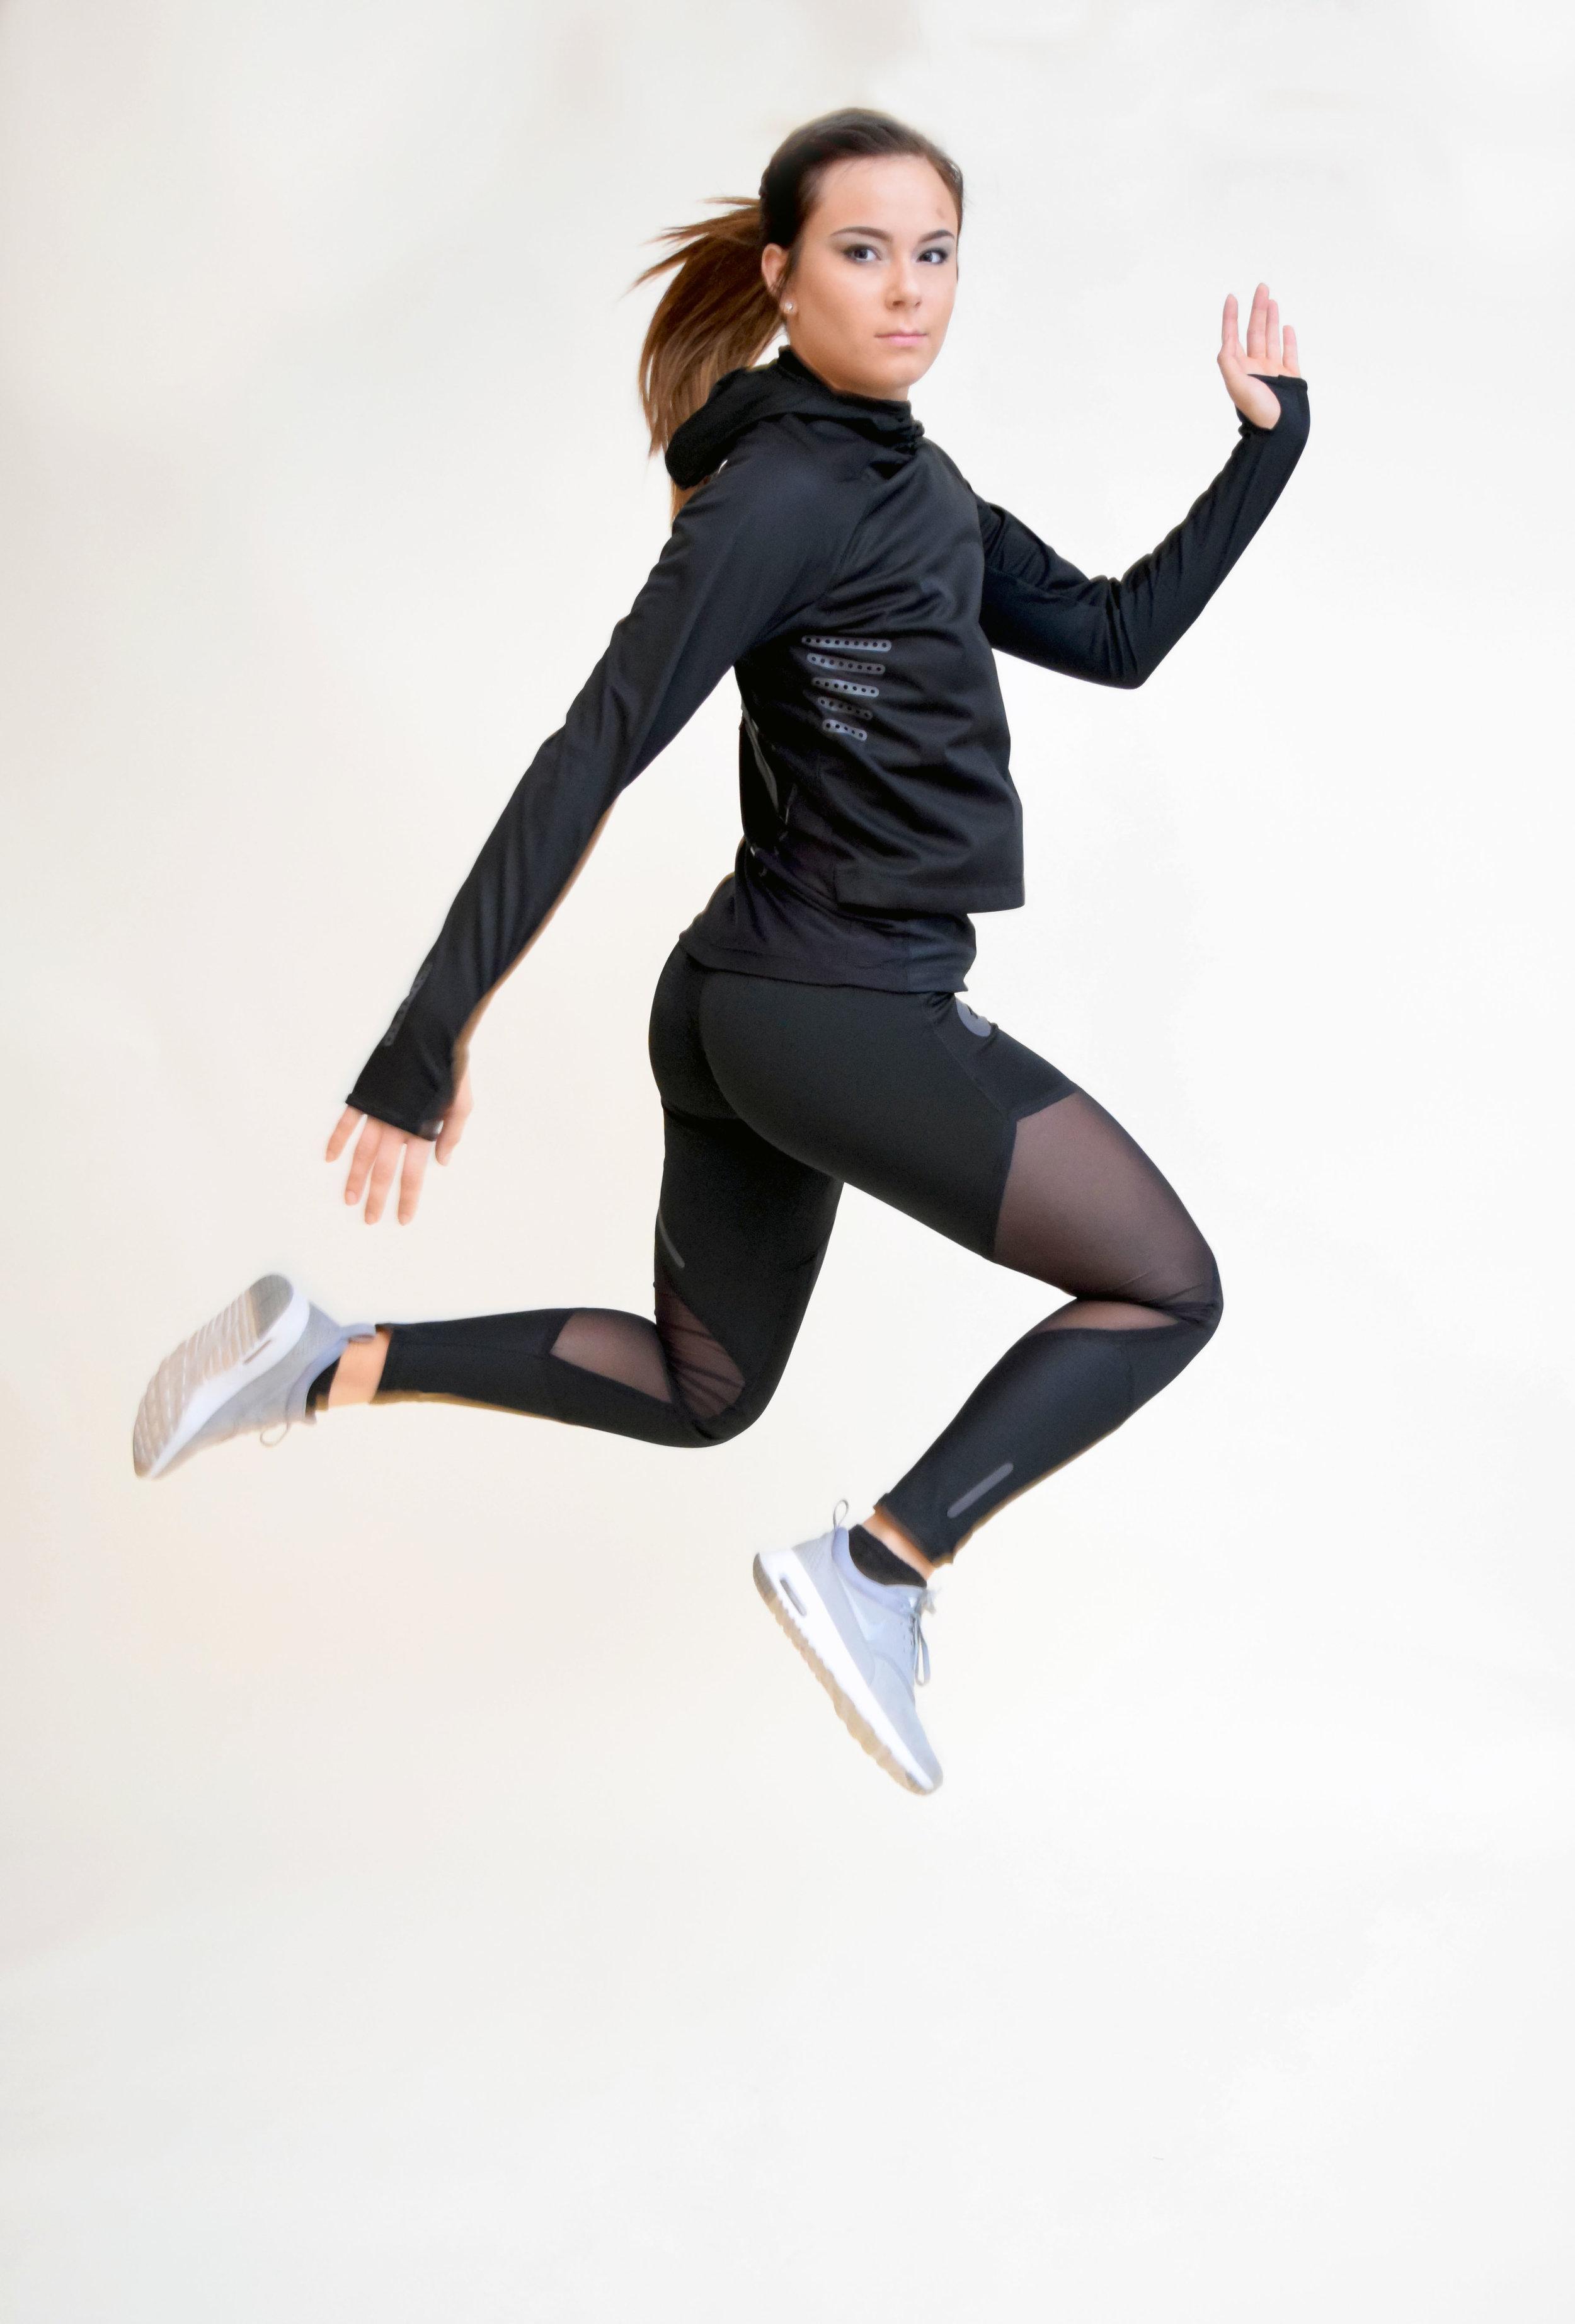 Nadine Side Jump.jpg